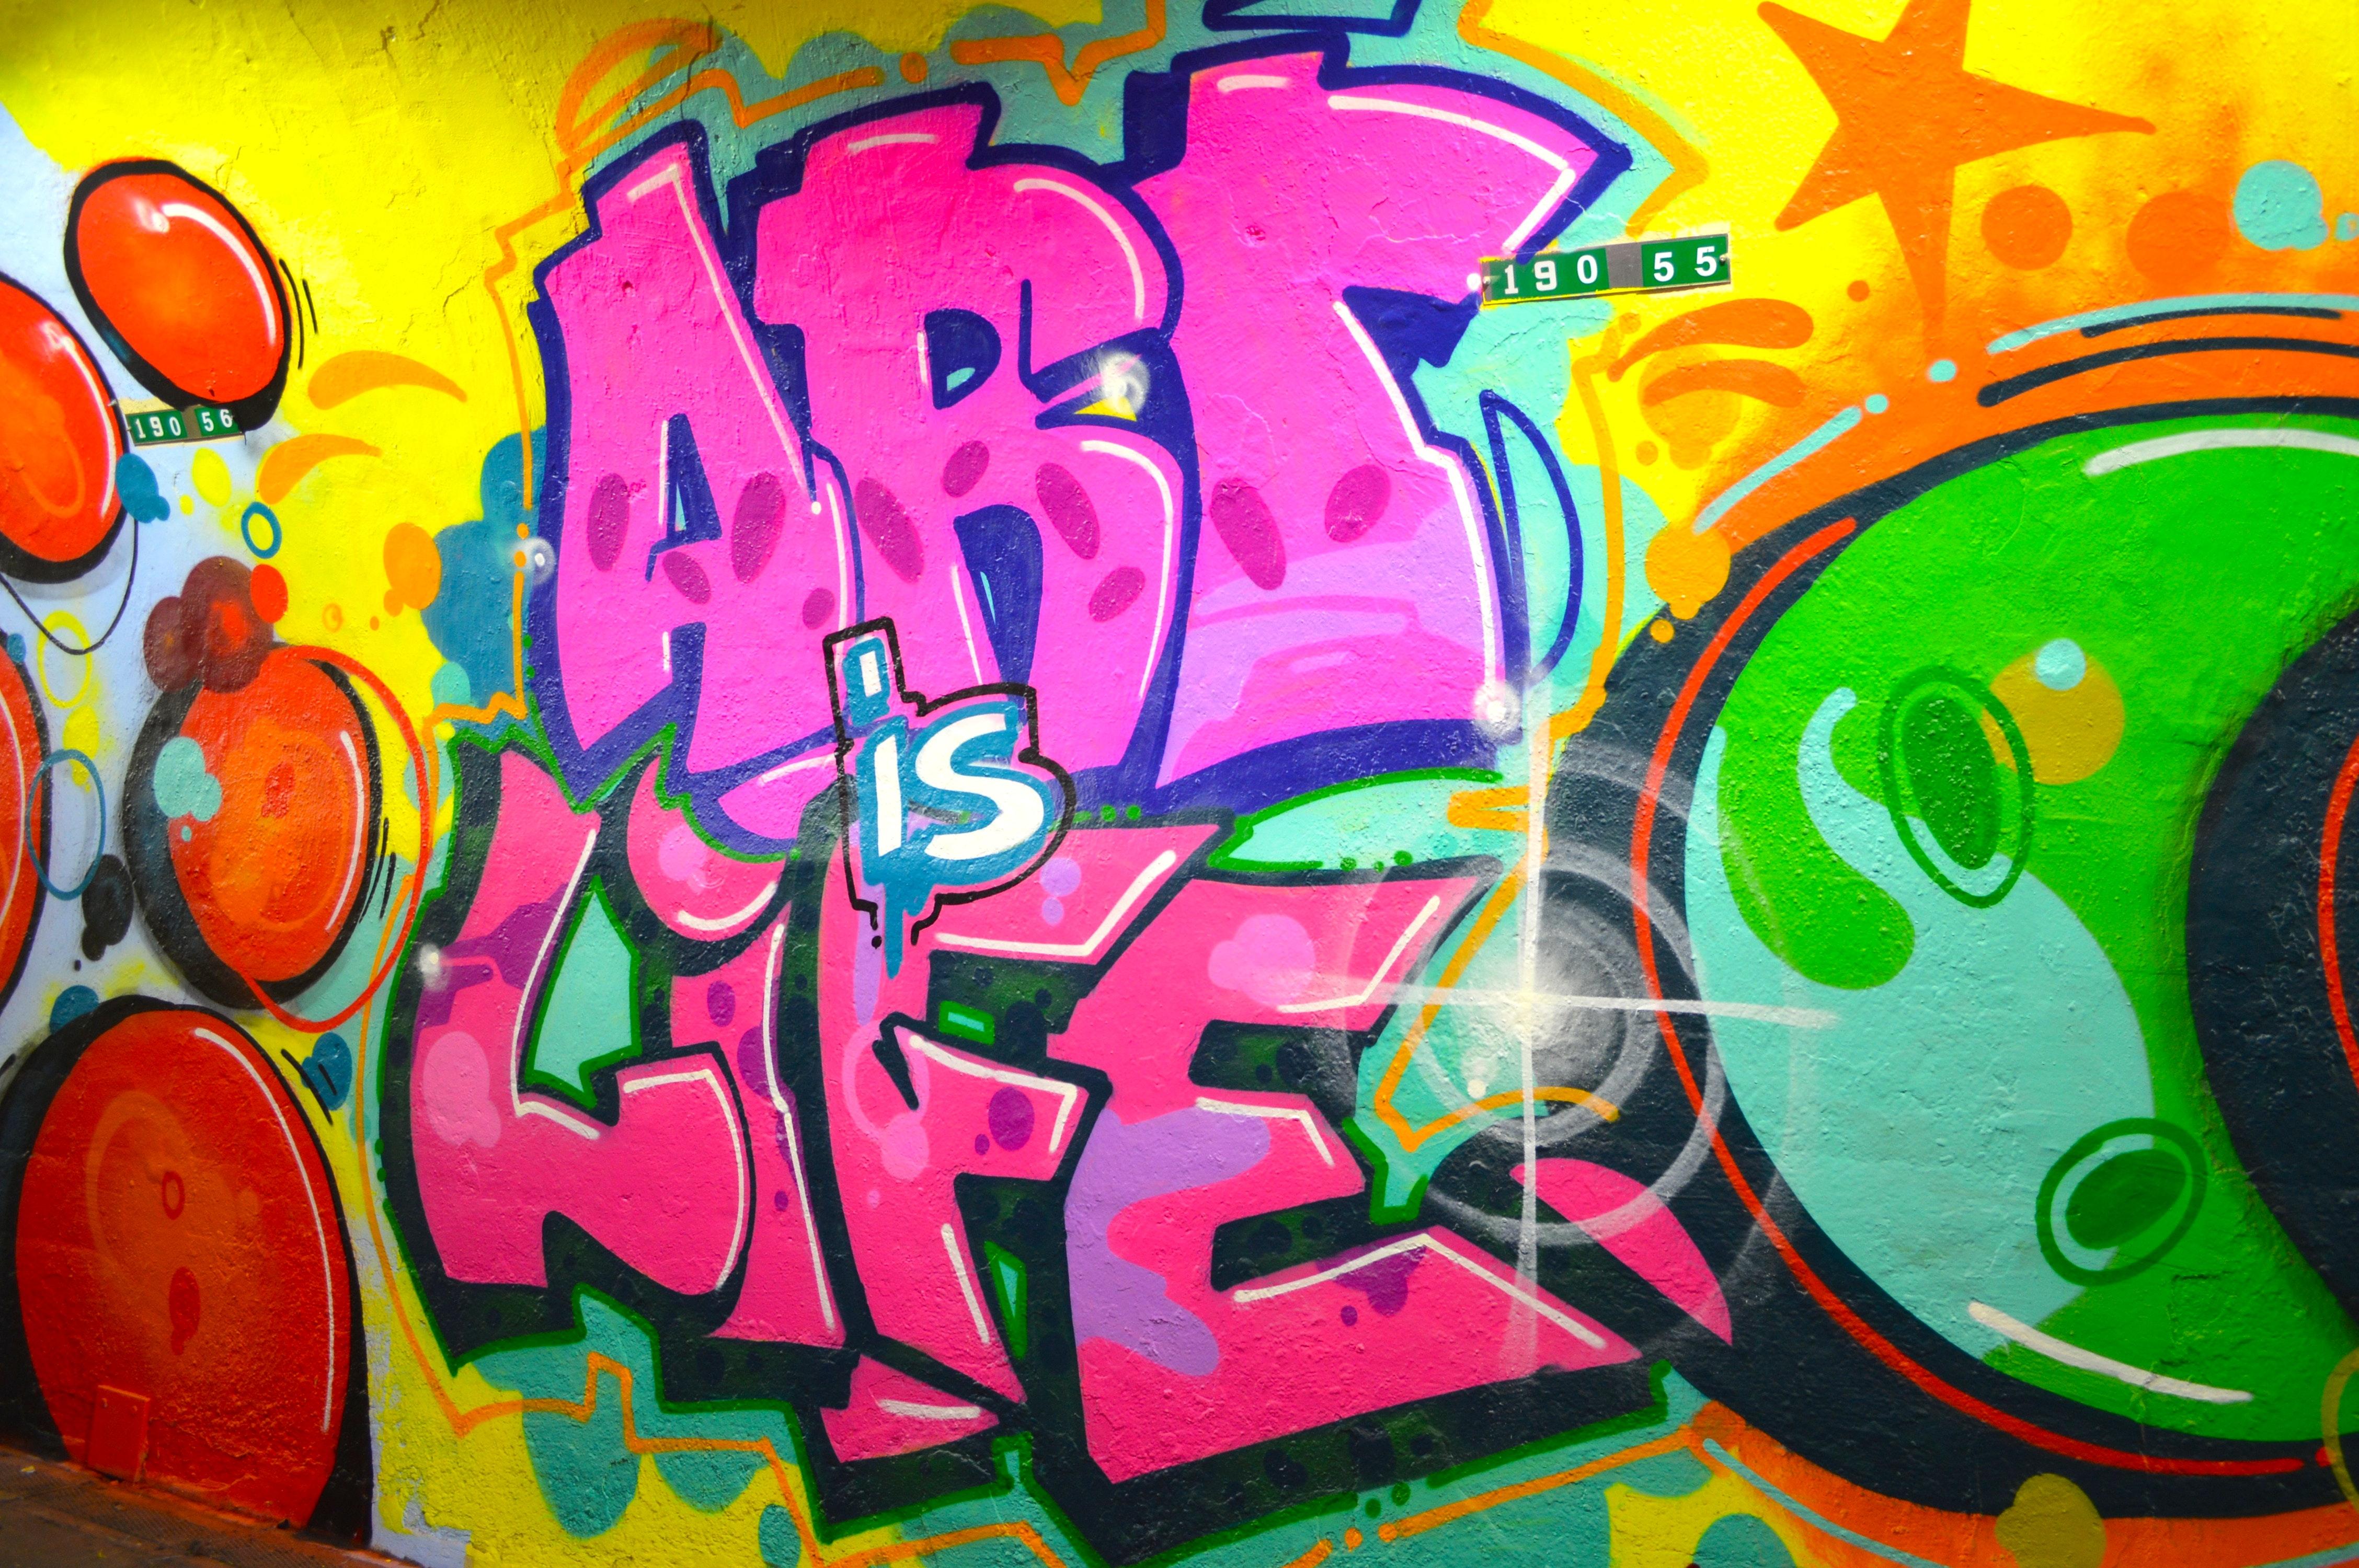 Cope2 Art is Life